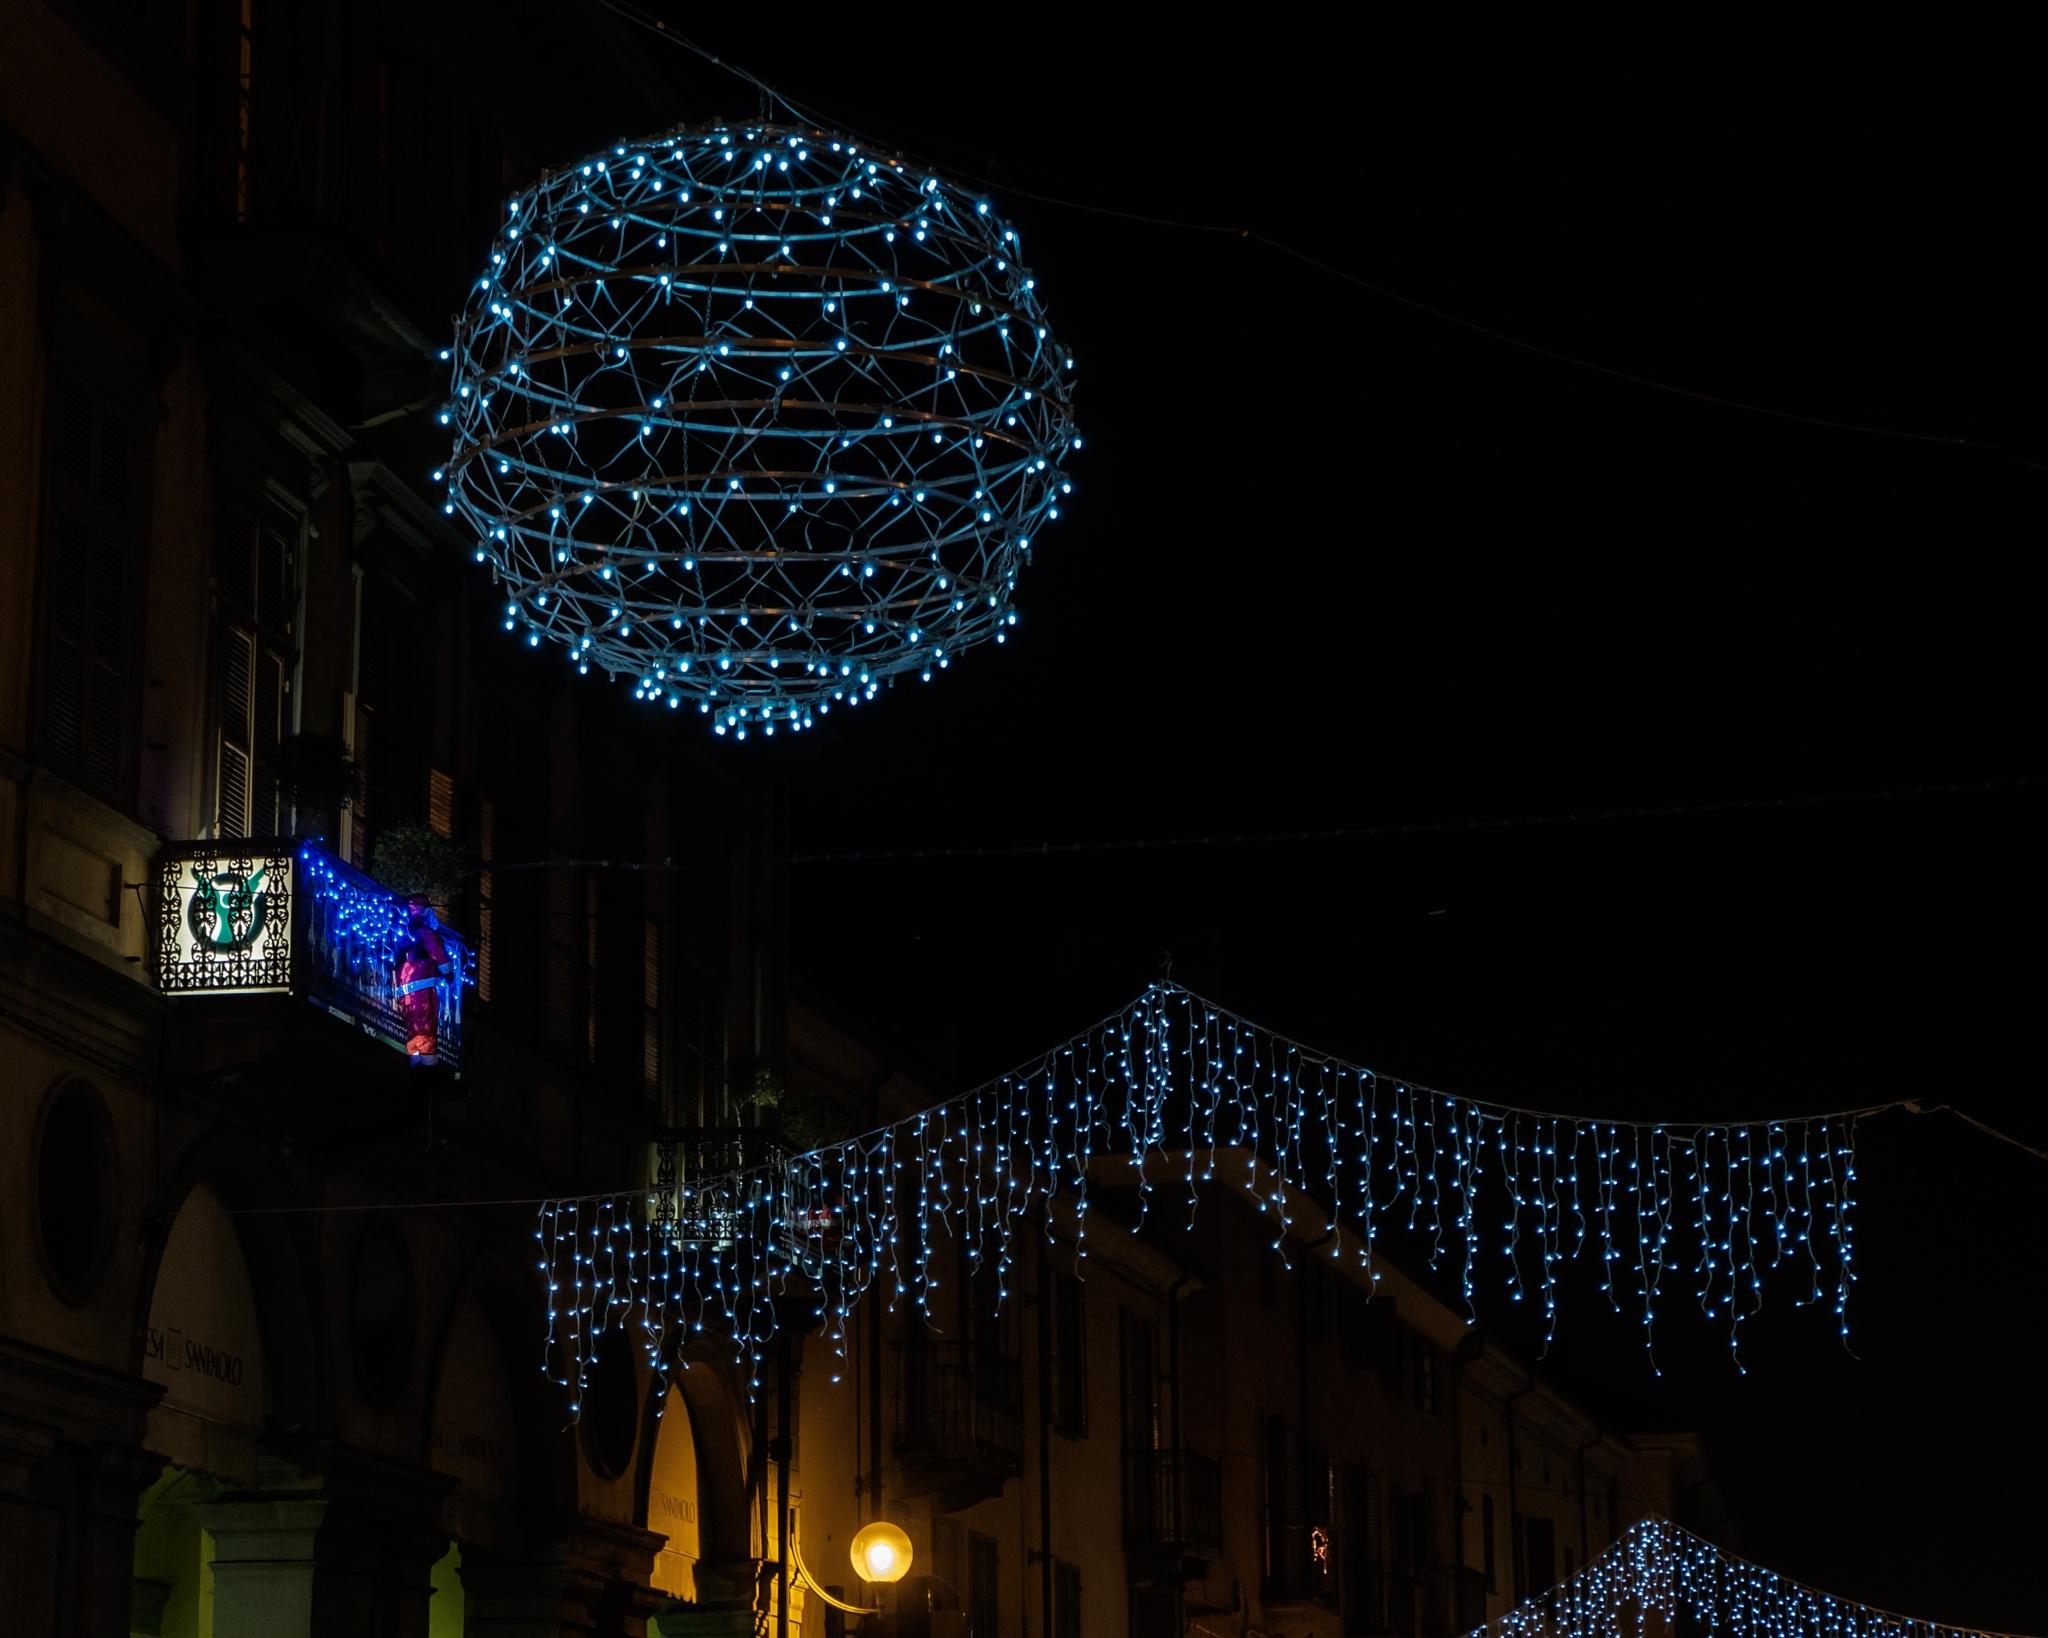 Luminarie by FrancescoPala